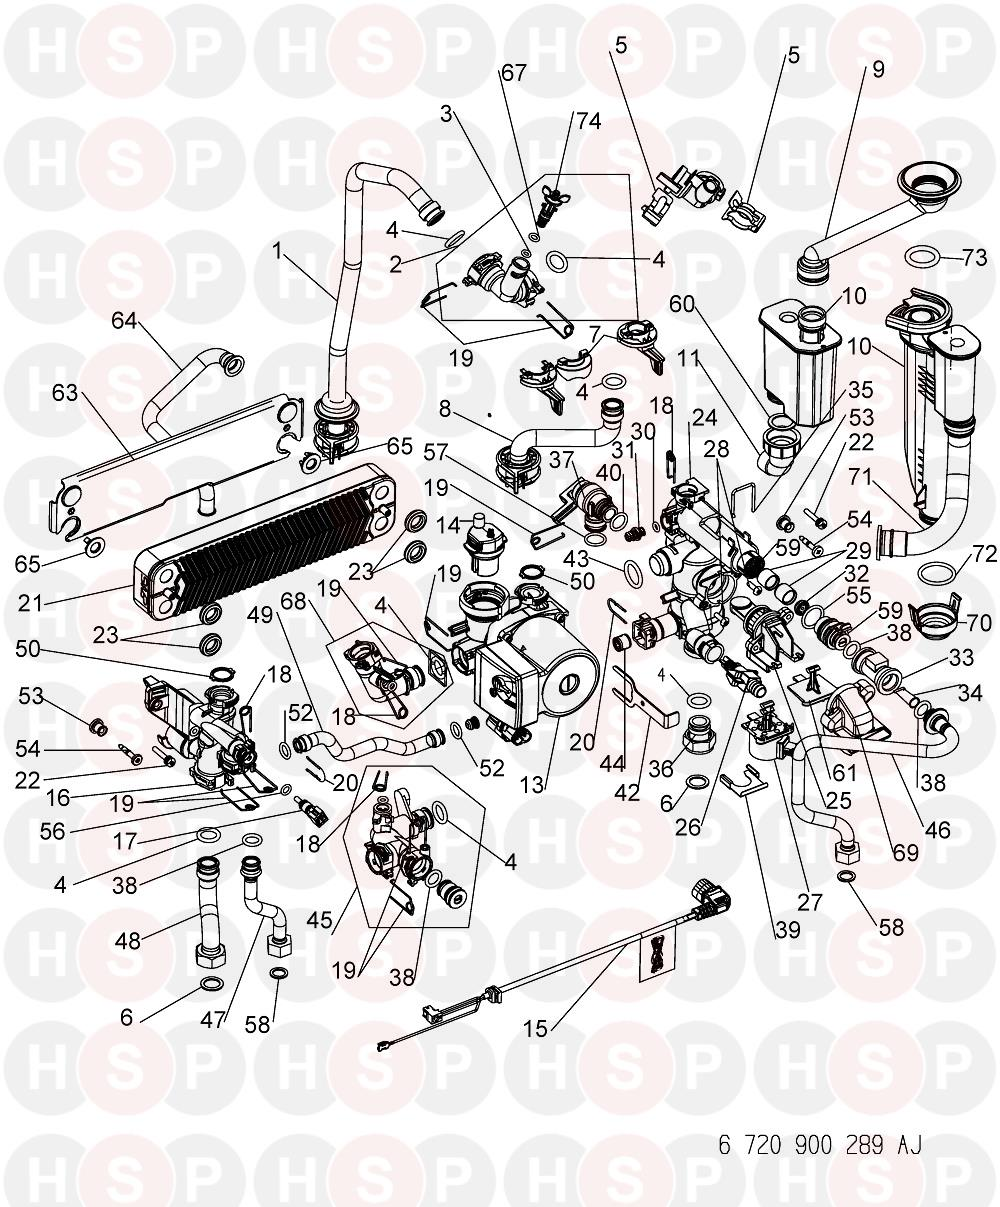 Worcester Greenstar 24i system (Hydraulics) Diagram   Heating Spare ...